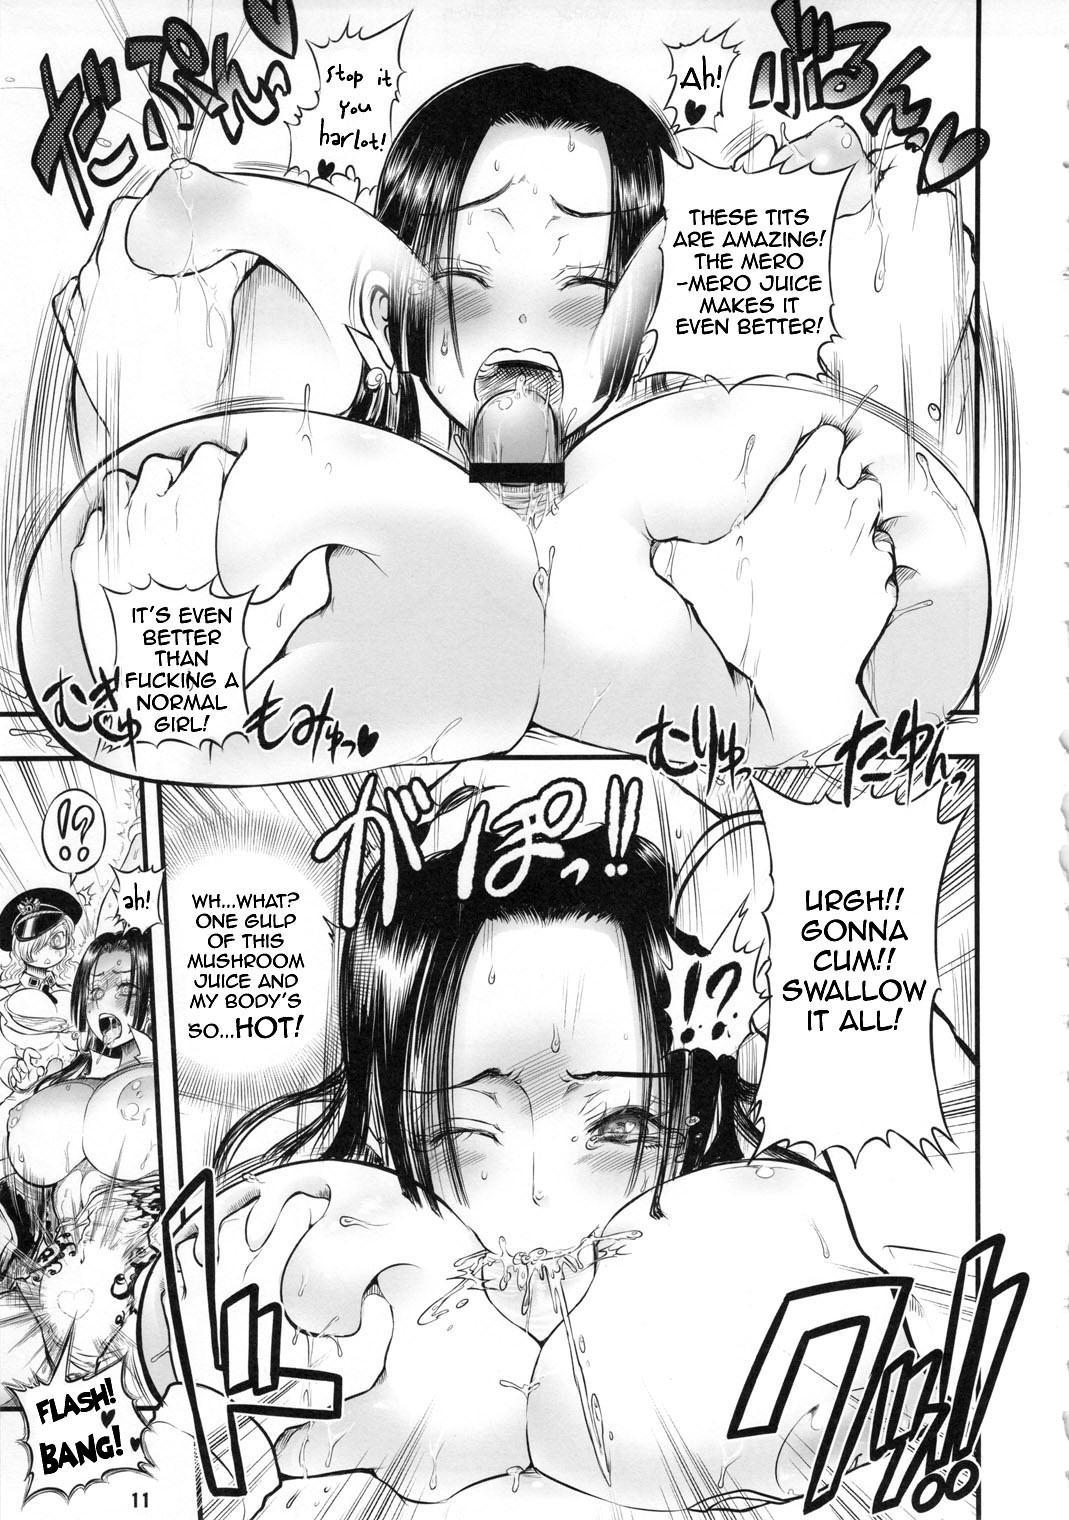 Midare Saki Joshuu Kaizoku Soushuuhen   Bloom, Pirate Hooker! Bloom! Annual 73